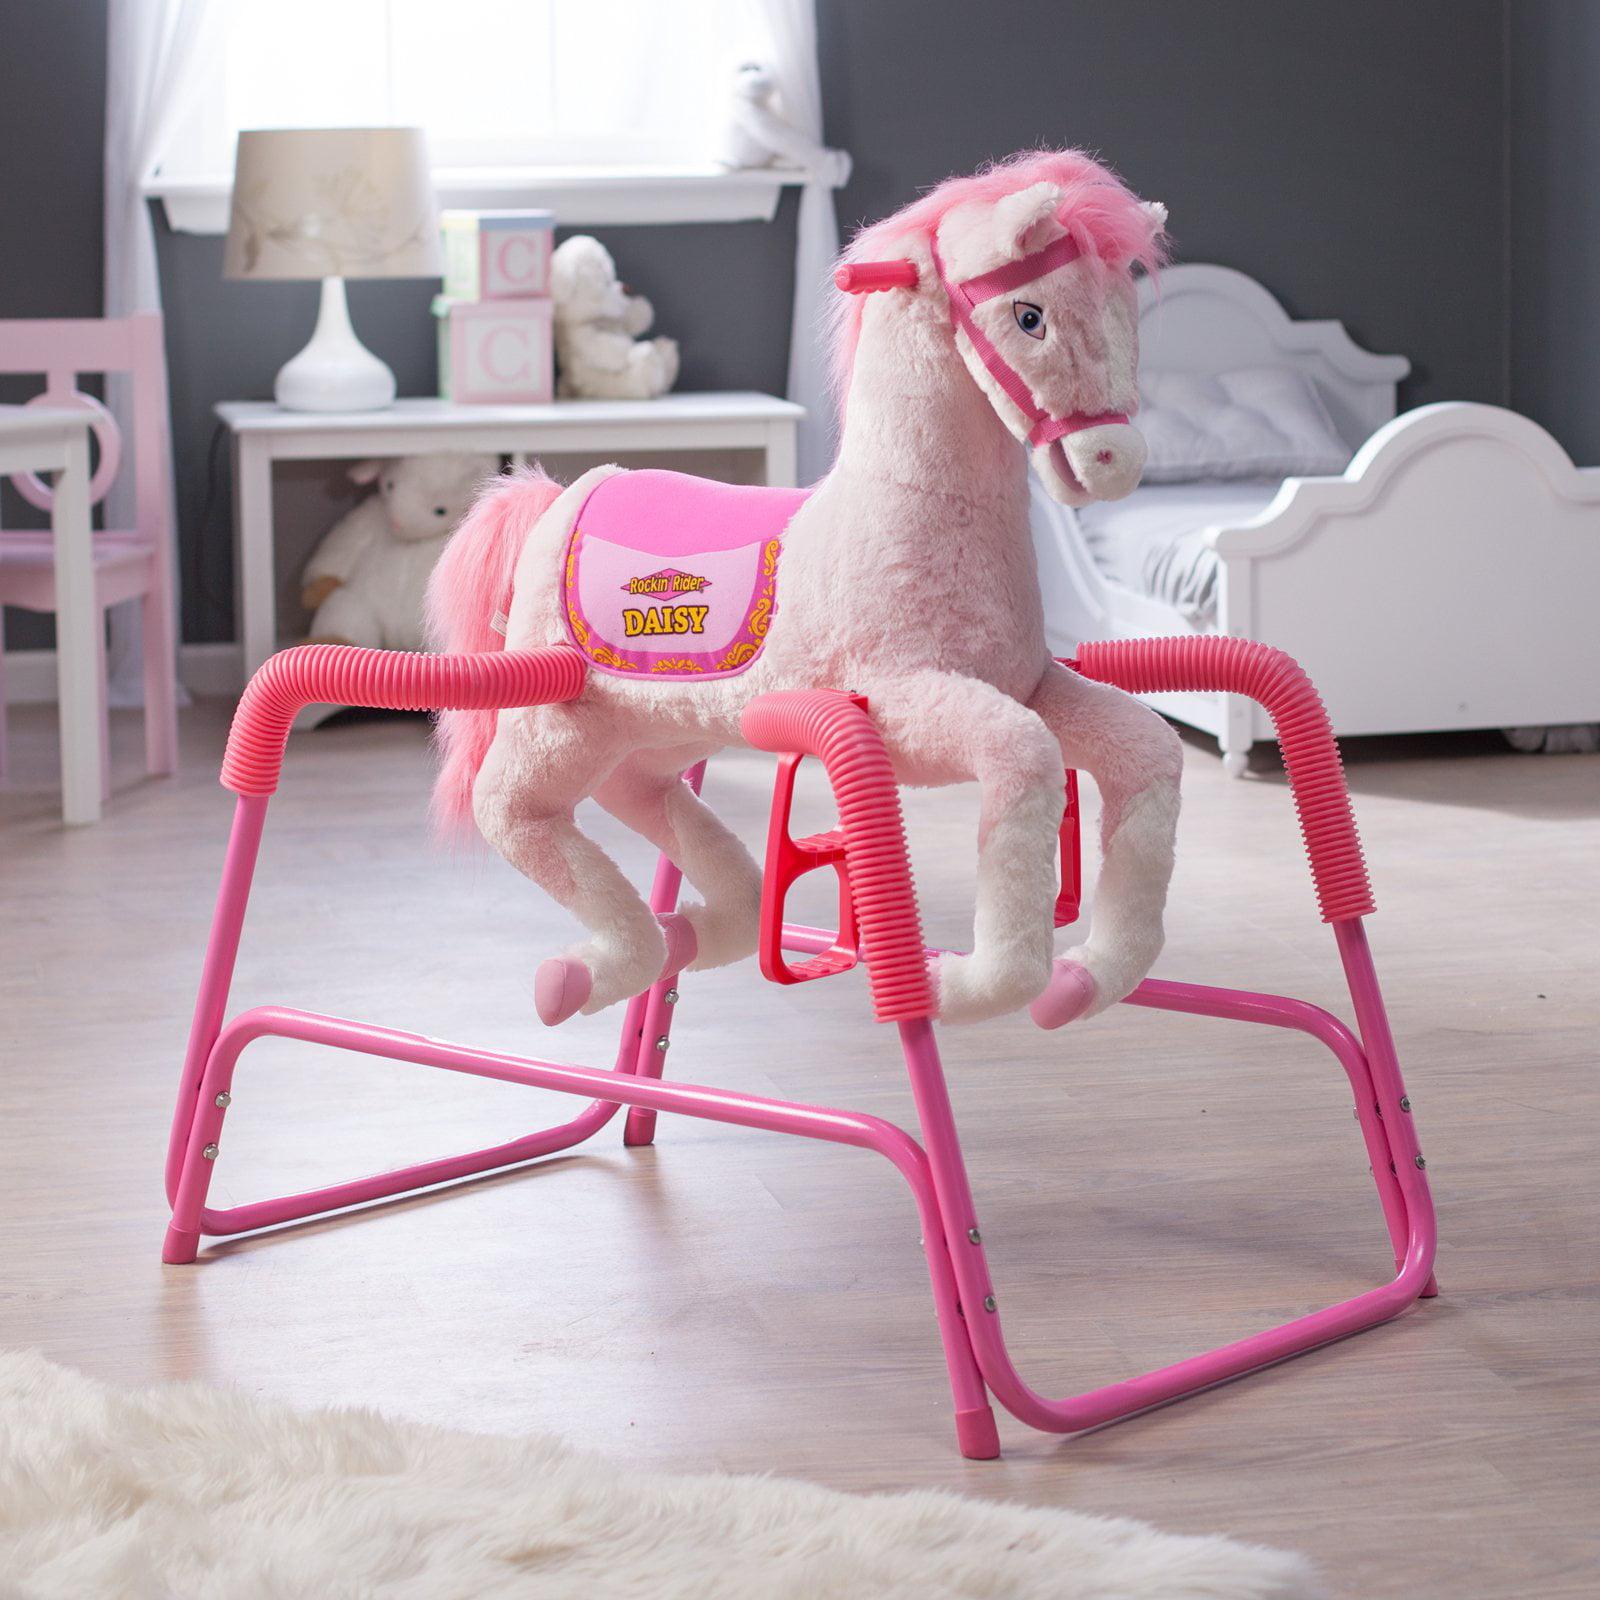 Rockin' Rider Daisy the Talking Spring Horse by Tek Nek Toys International